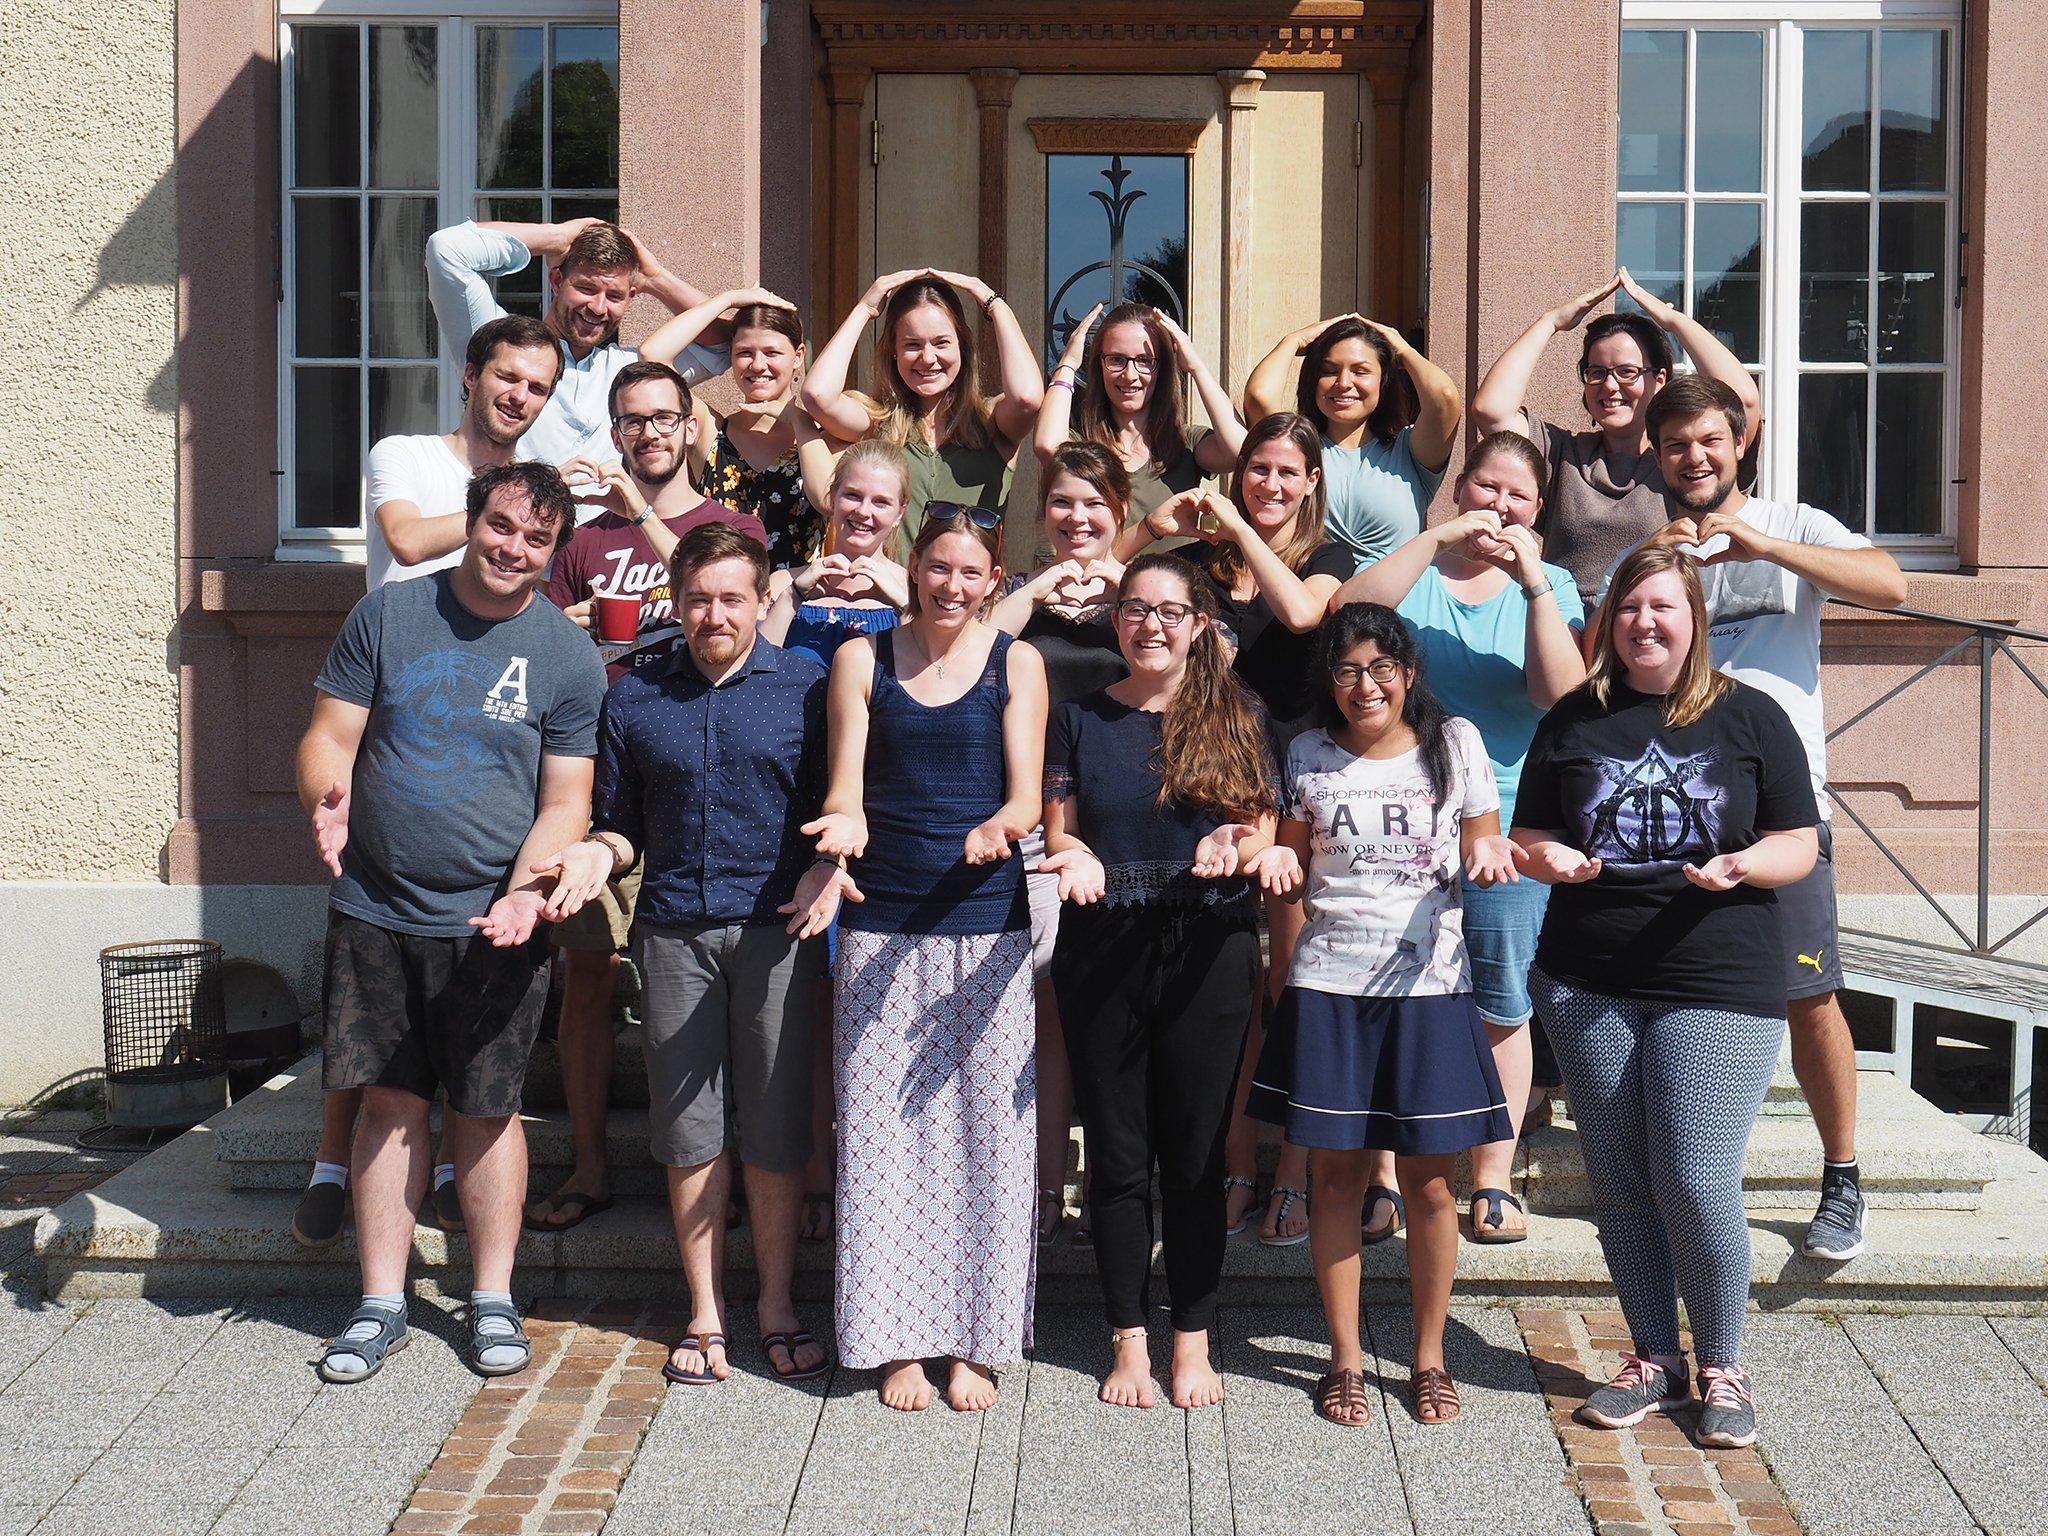 tsc-Start 19/20: Studierende im Bachelorstudiengang Theologie & Pädagogik